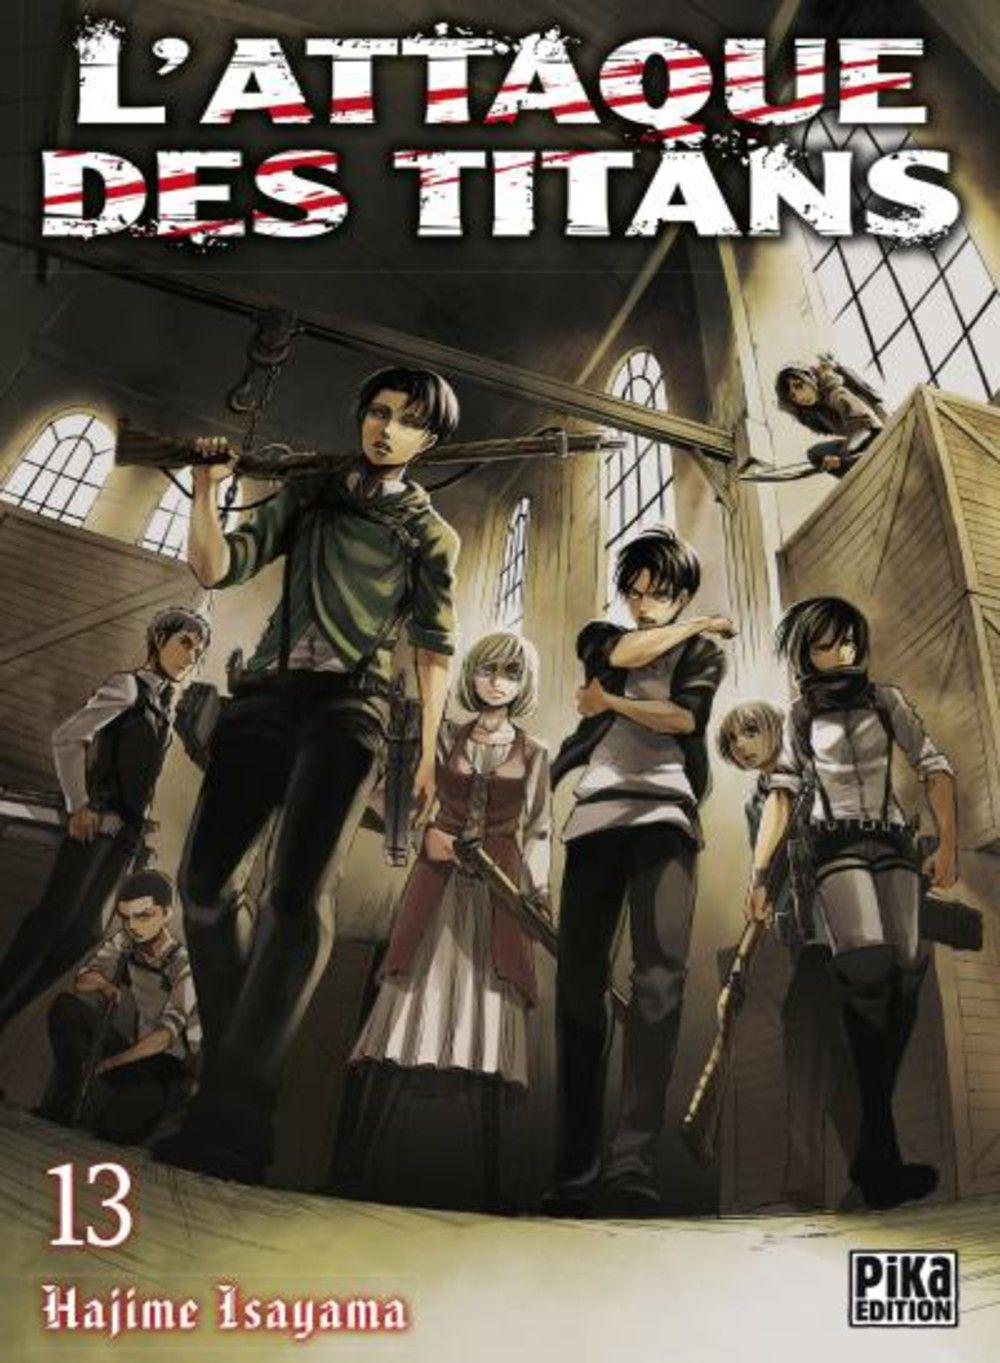 L'Attaque des Titans, tome 13 - Hajime Isayama - SensCritique